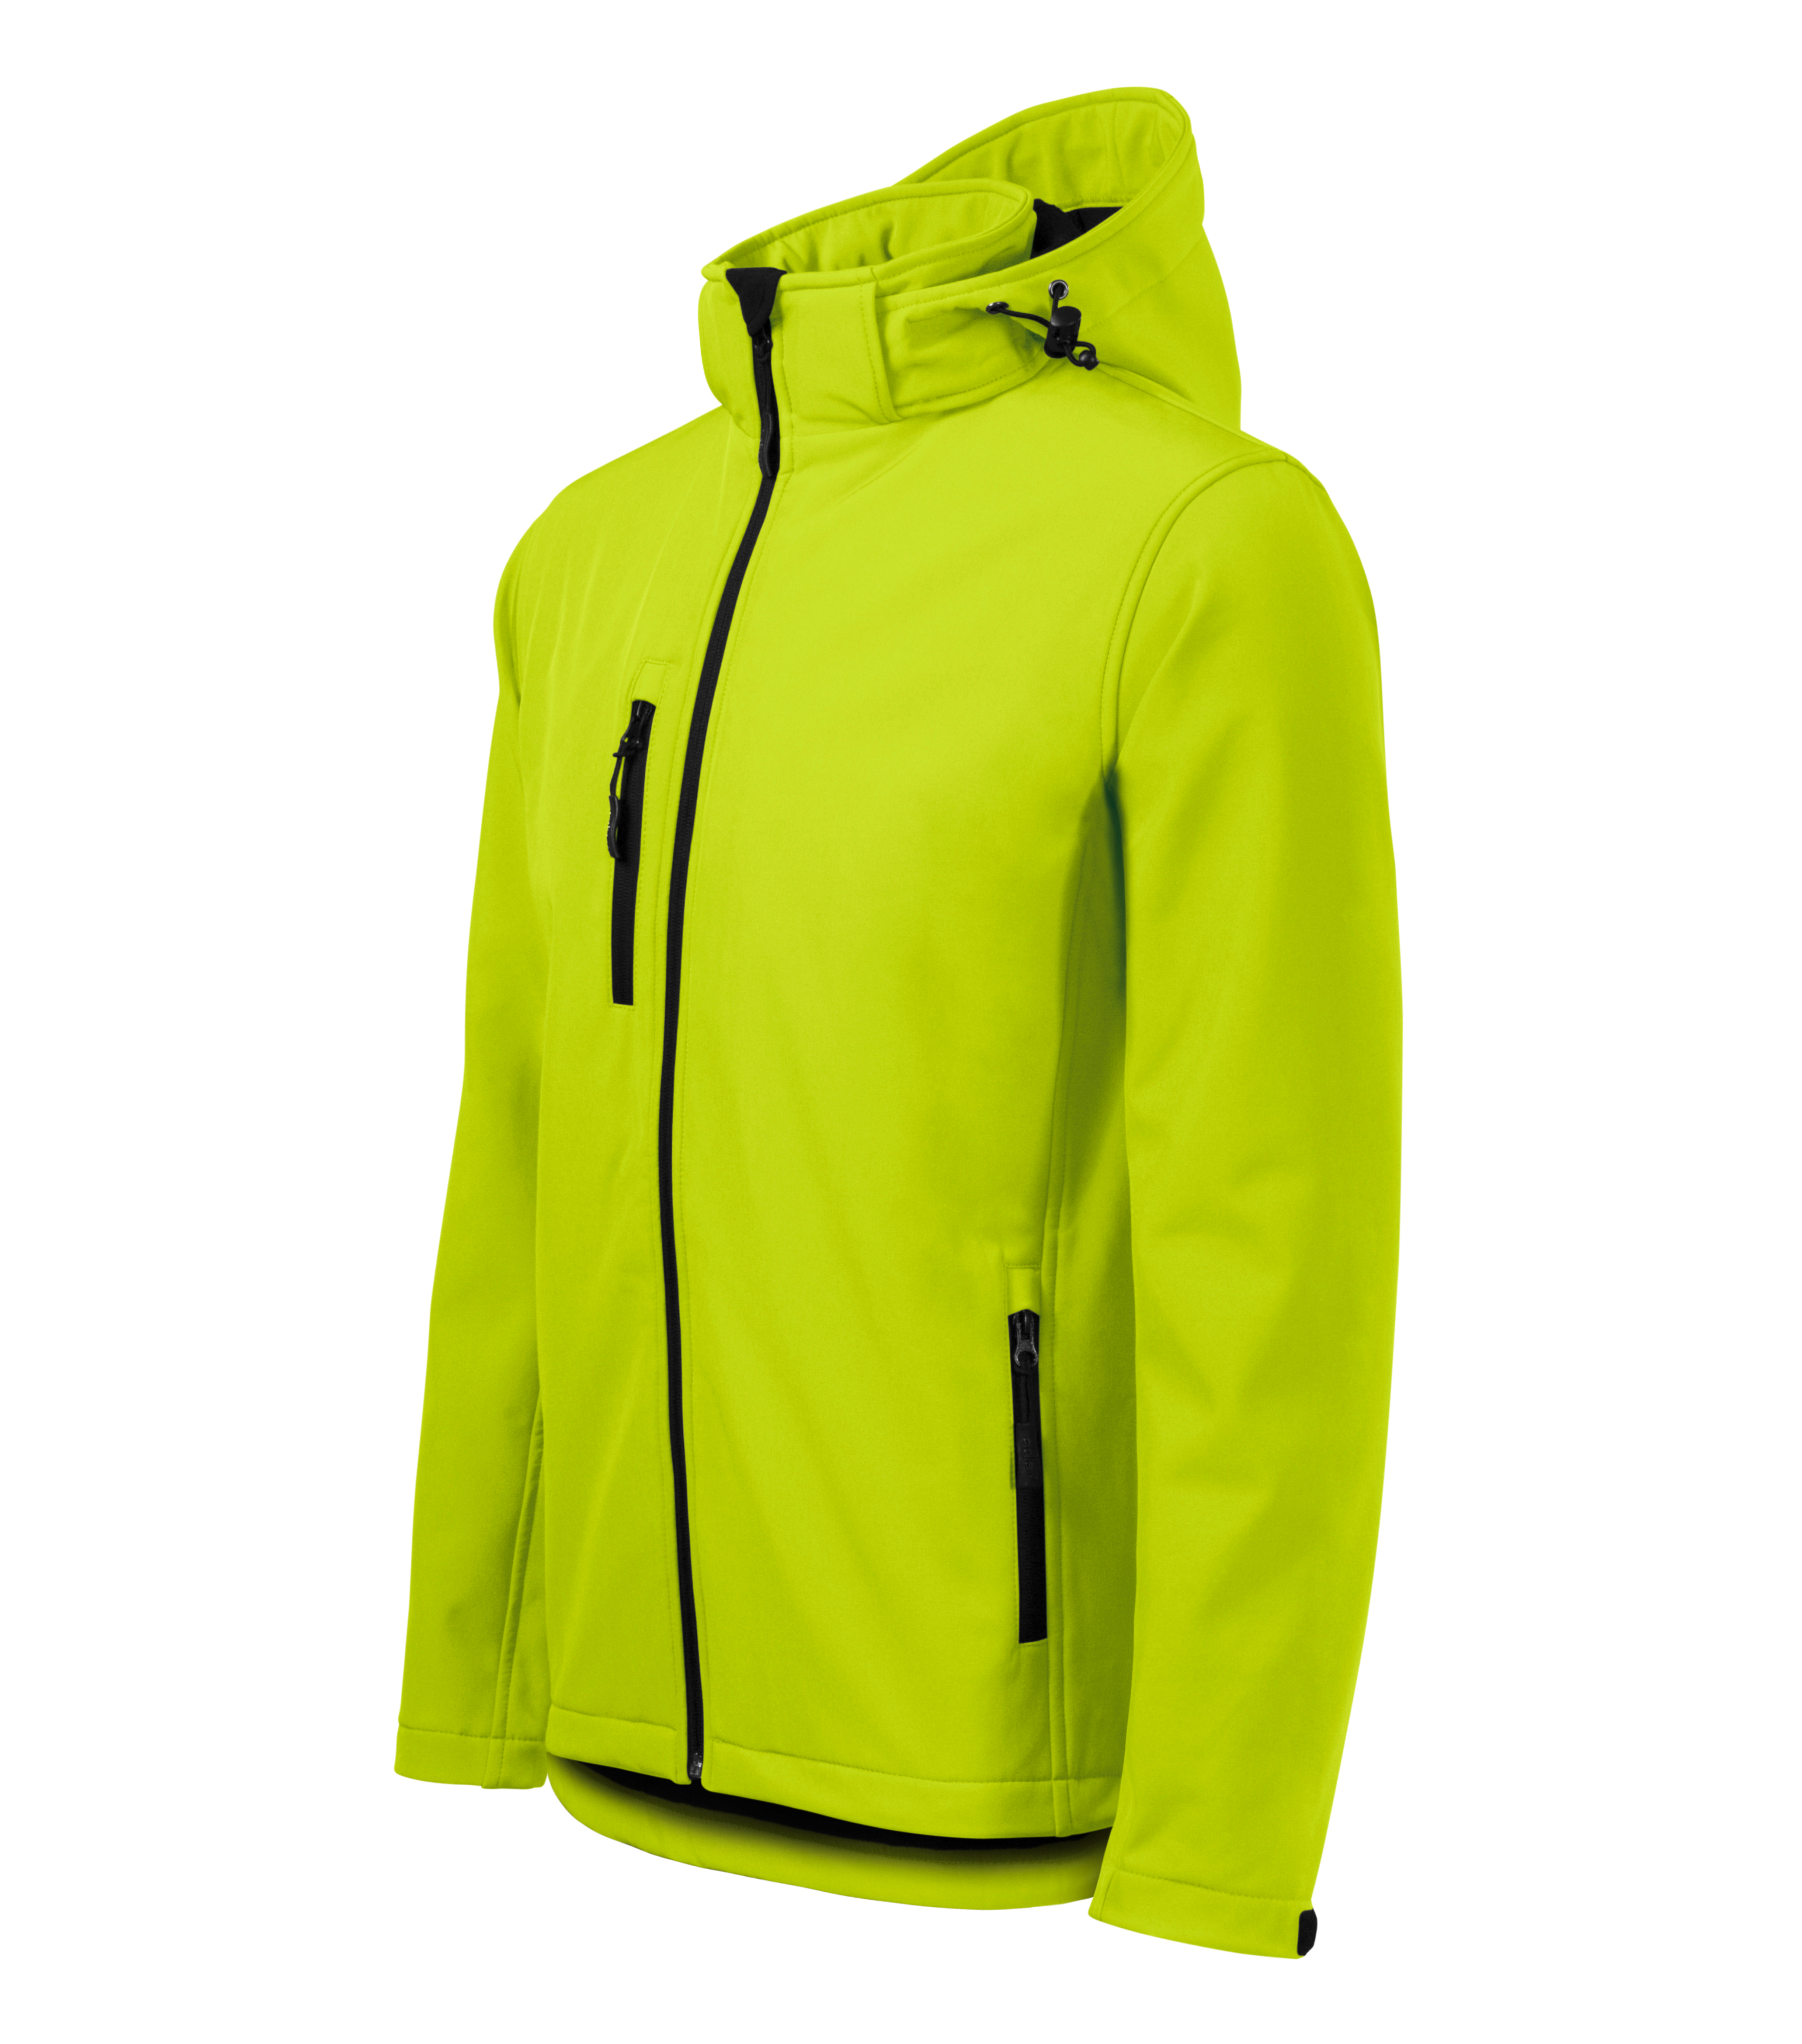 Limonkowa kurtka softshell Performance męska